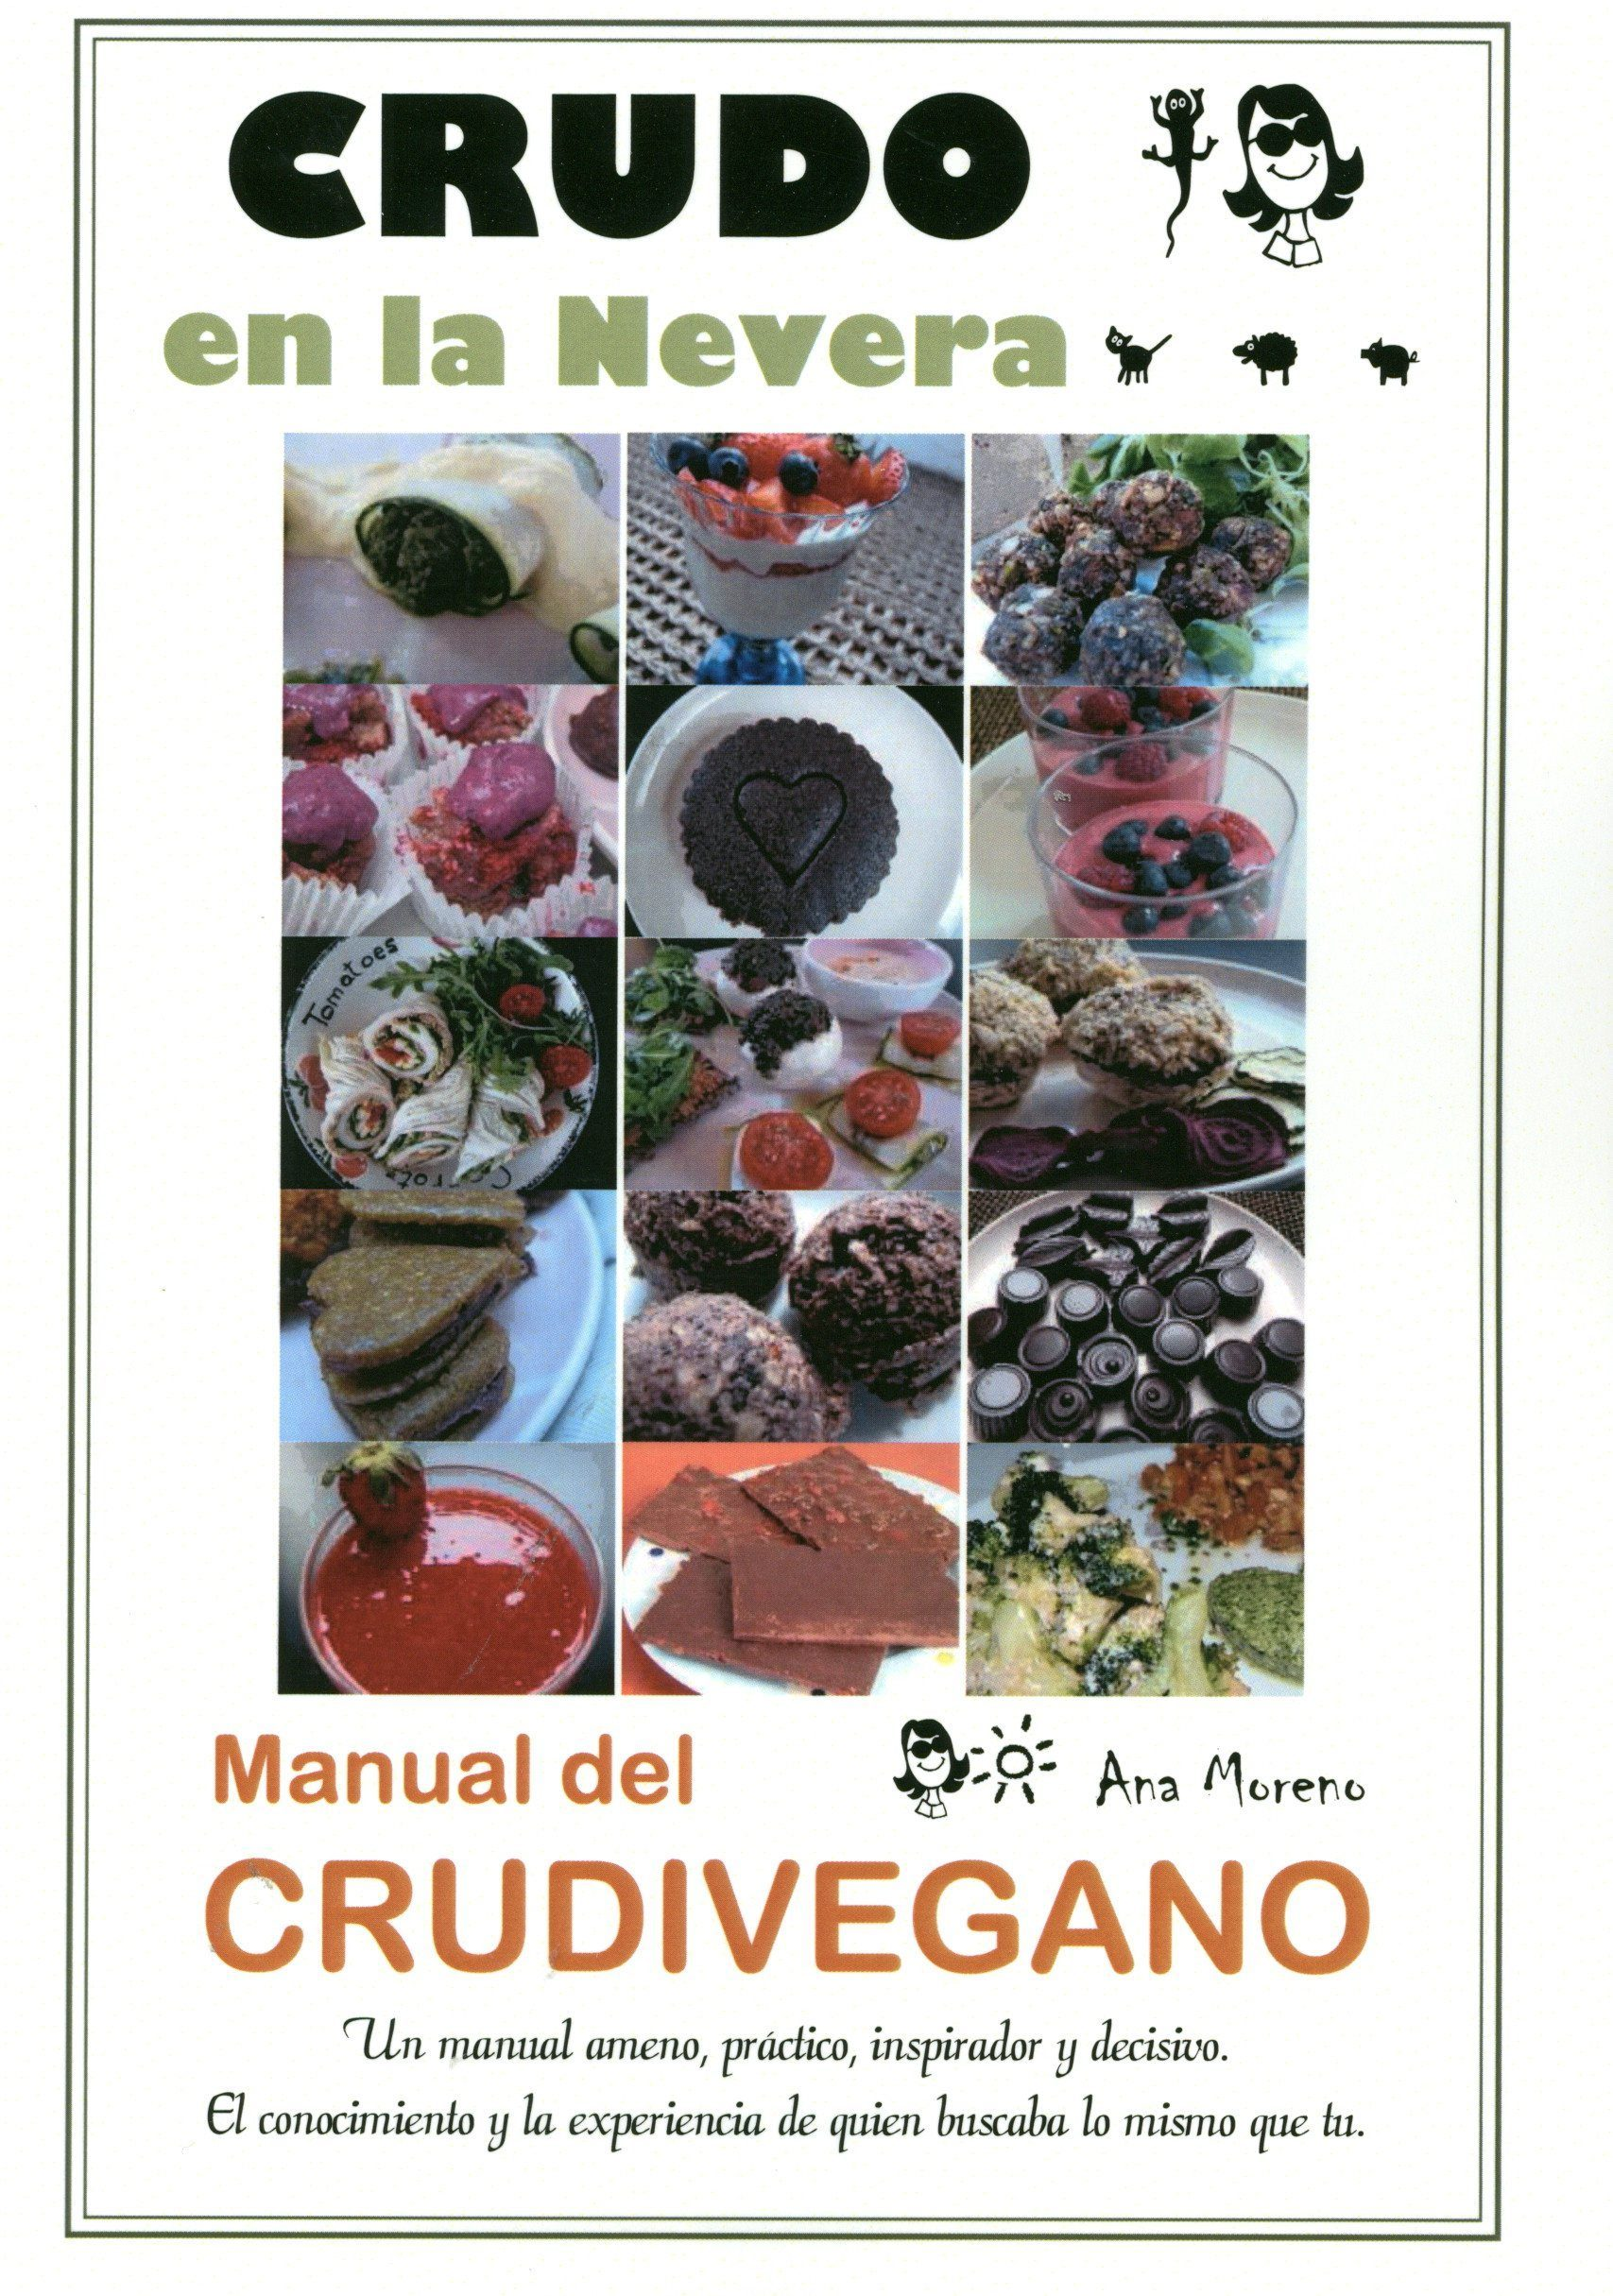 crudo en la nevera: manual del crudivegano-ana moreno-9788493753900